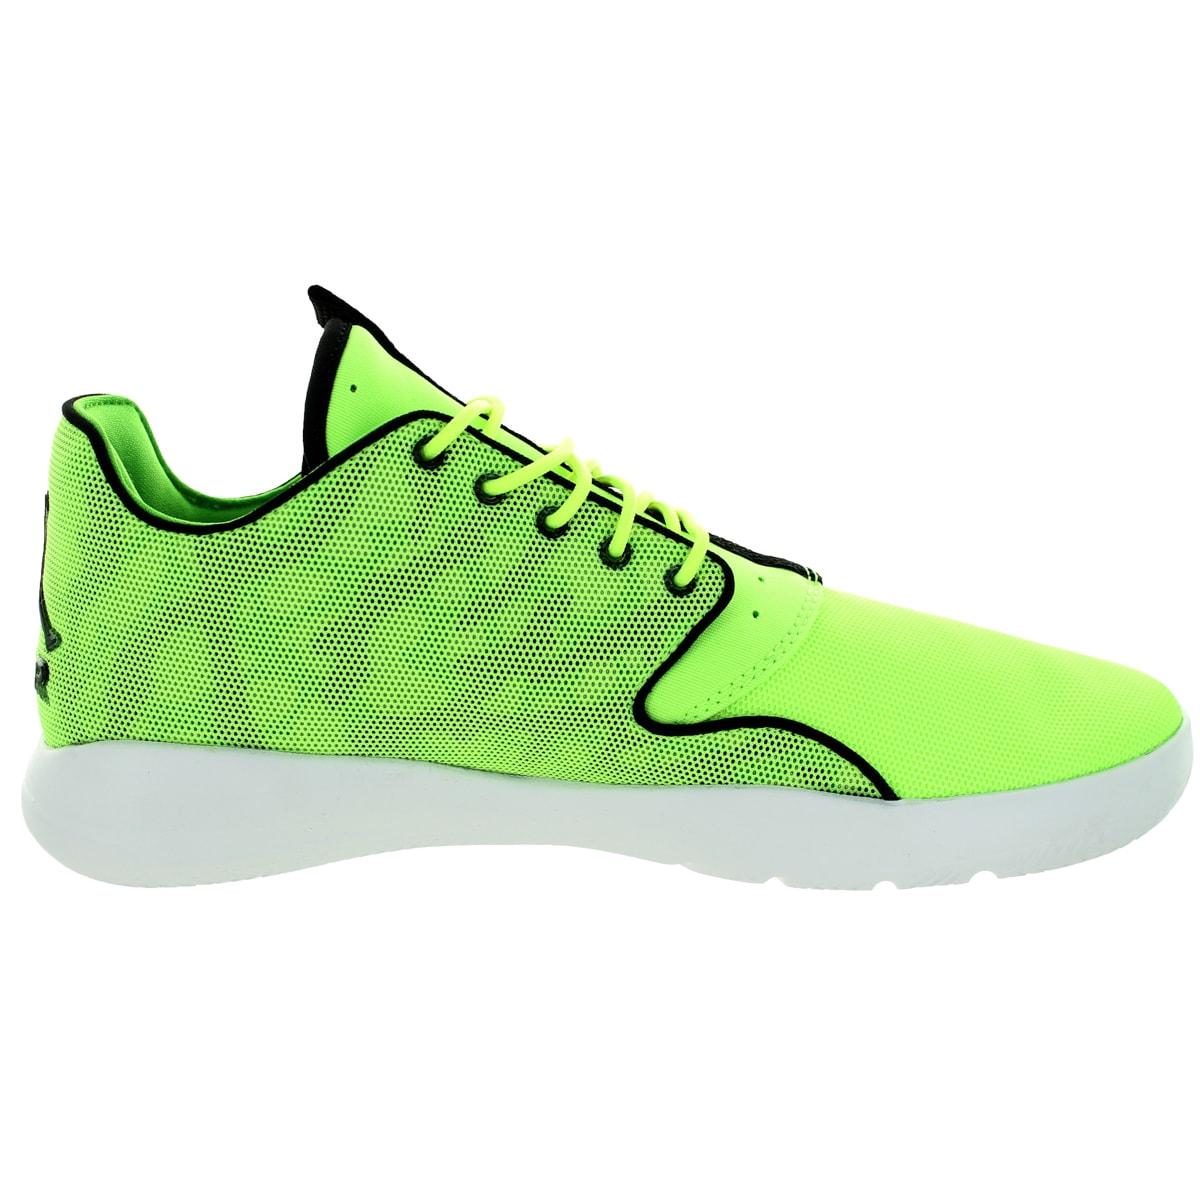 8ad180b5ffd0a5 Shop Nike Jordan Men s Jordan Eclipse Ghost Green Black G Pls White Running  Shoe - Free Shipping Today - Overstock.com - 12318493